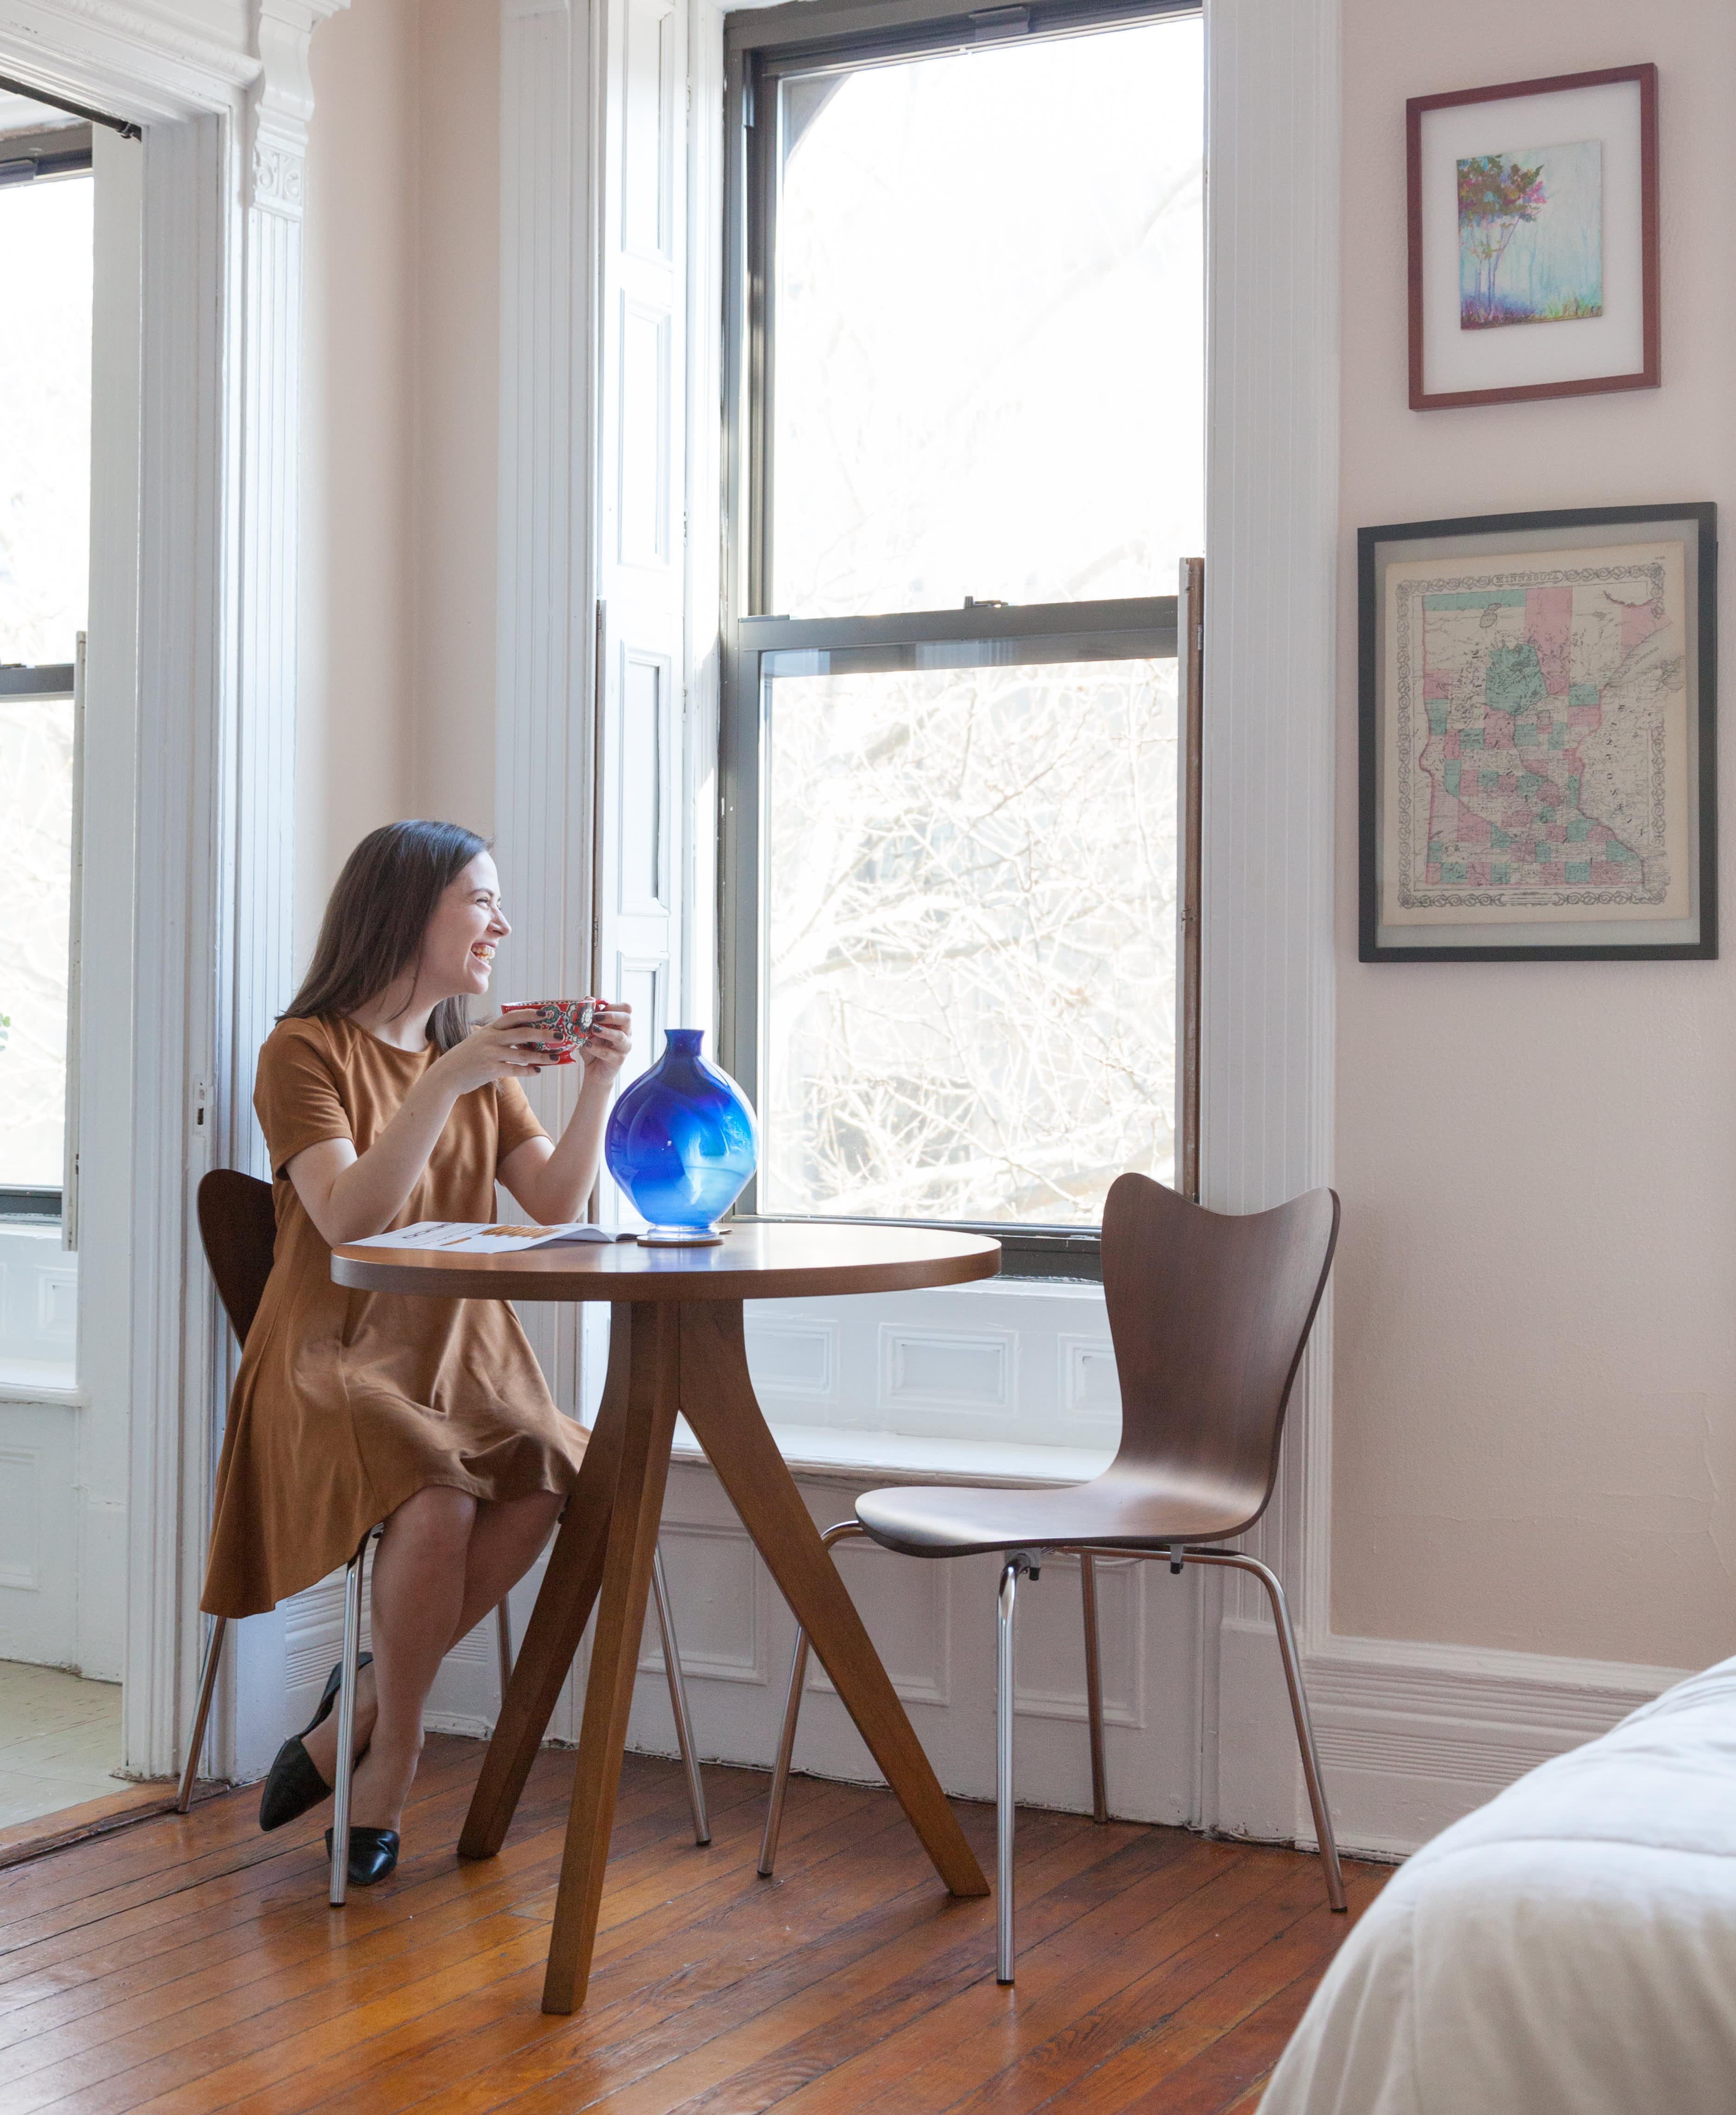 Brooklyn Studio Apartments: House Tour: A Writer's 350 Square Foot Brooklyn Studio